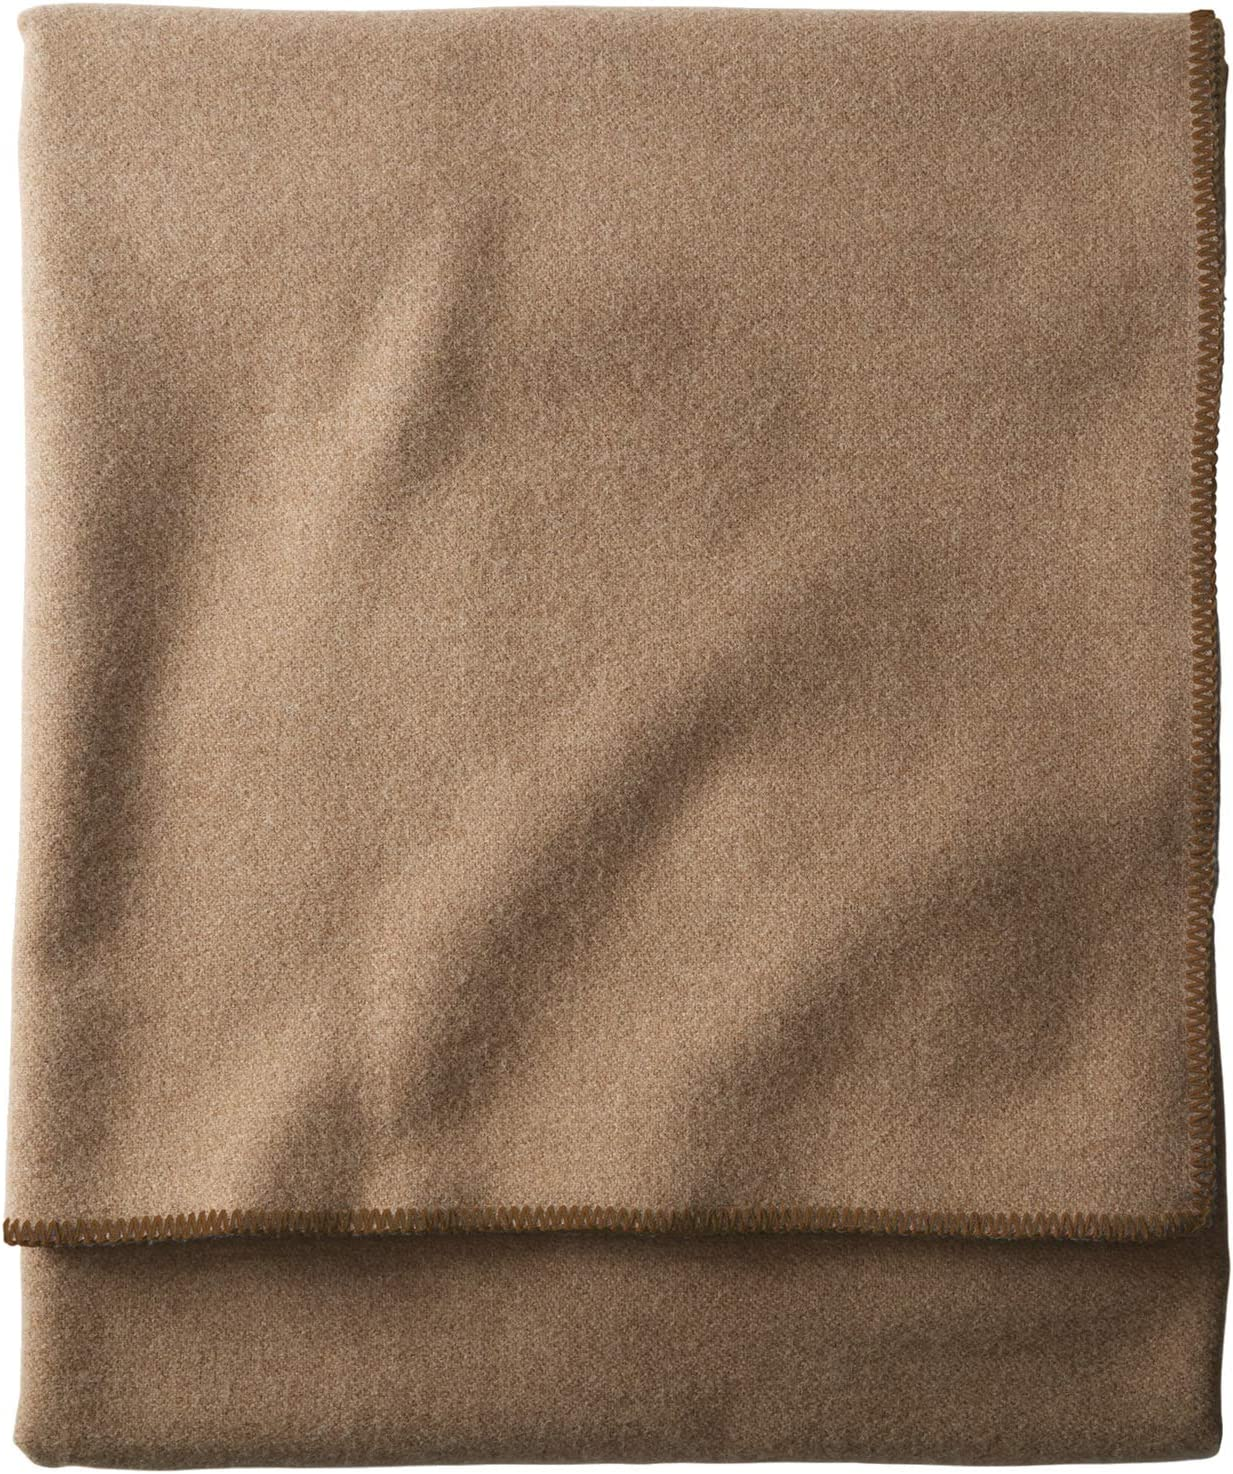 7. Pendleton Eco-Wise Wool Washable Blanket